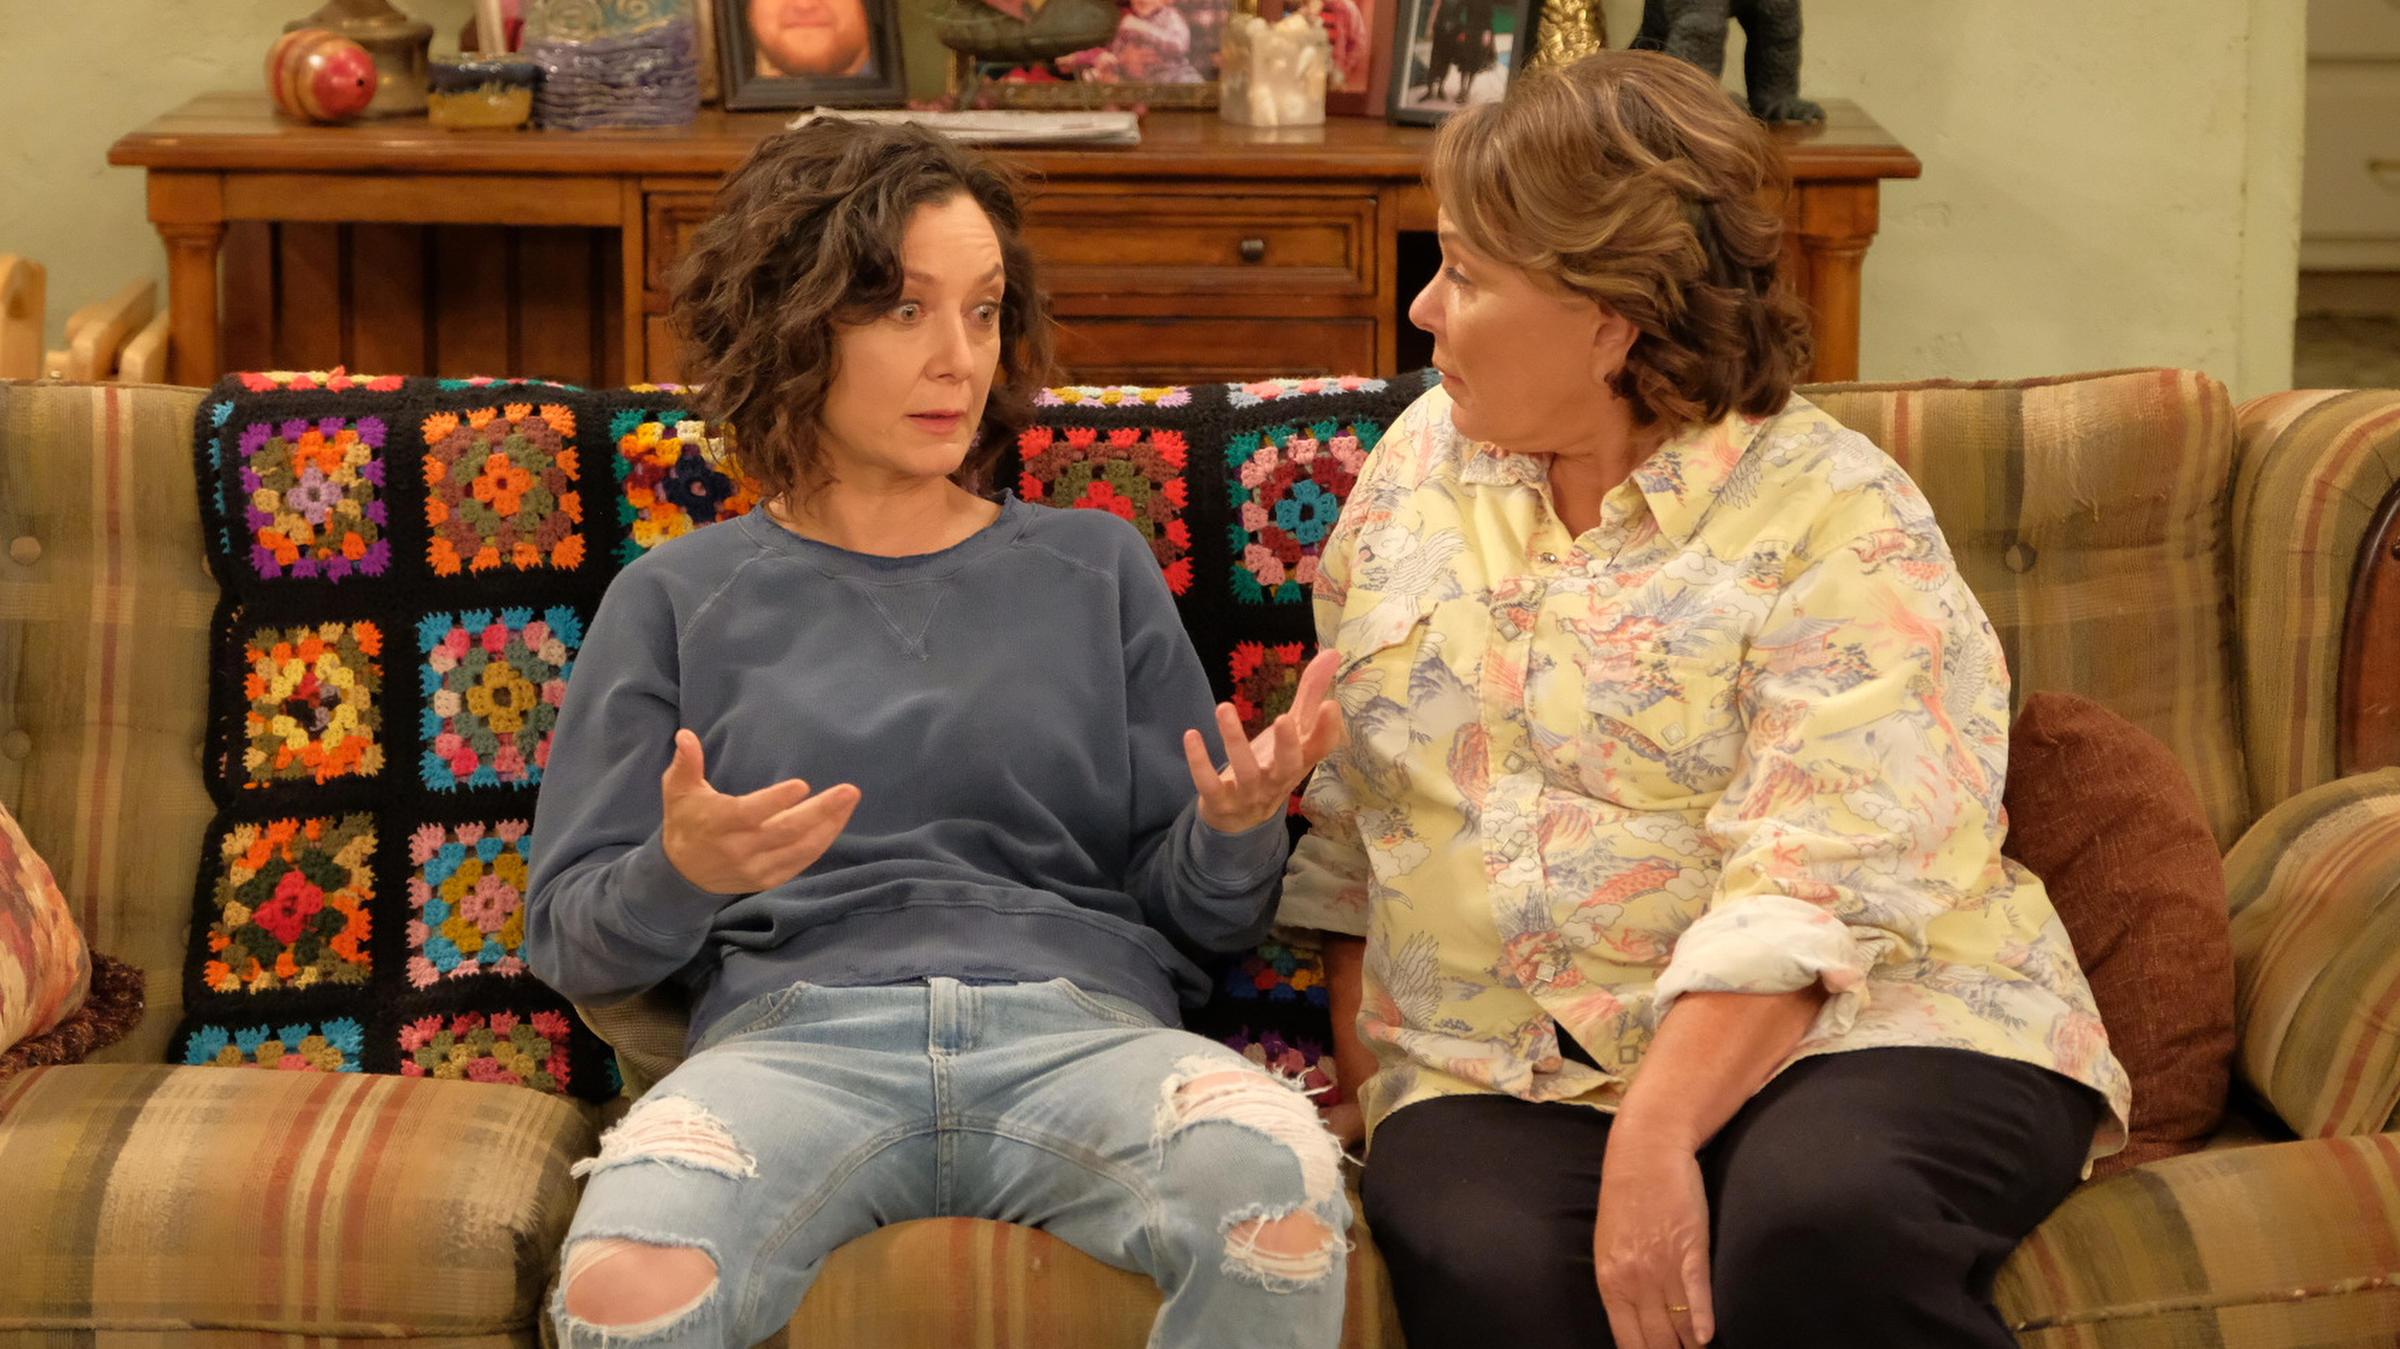 Roseanne Barr Reveals Why a 'Roseanne' Revival Didn't Happen Sooner